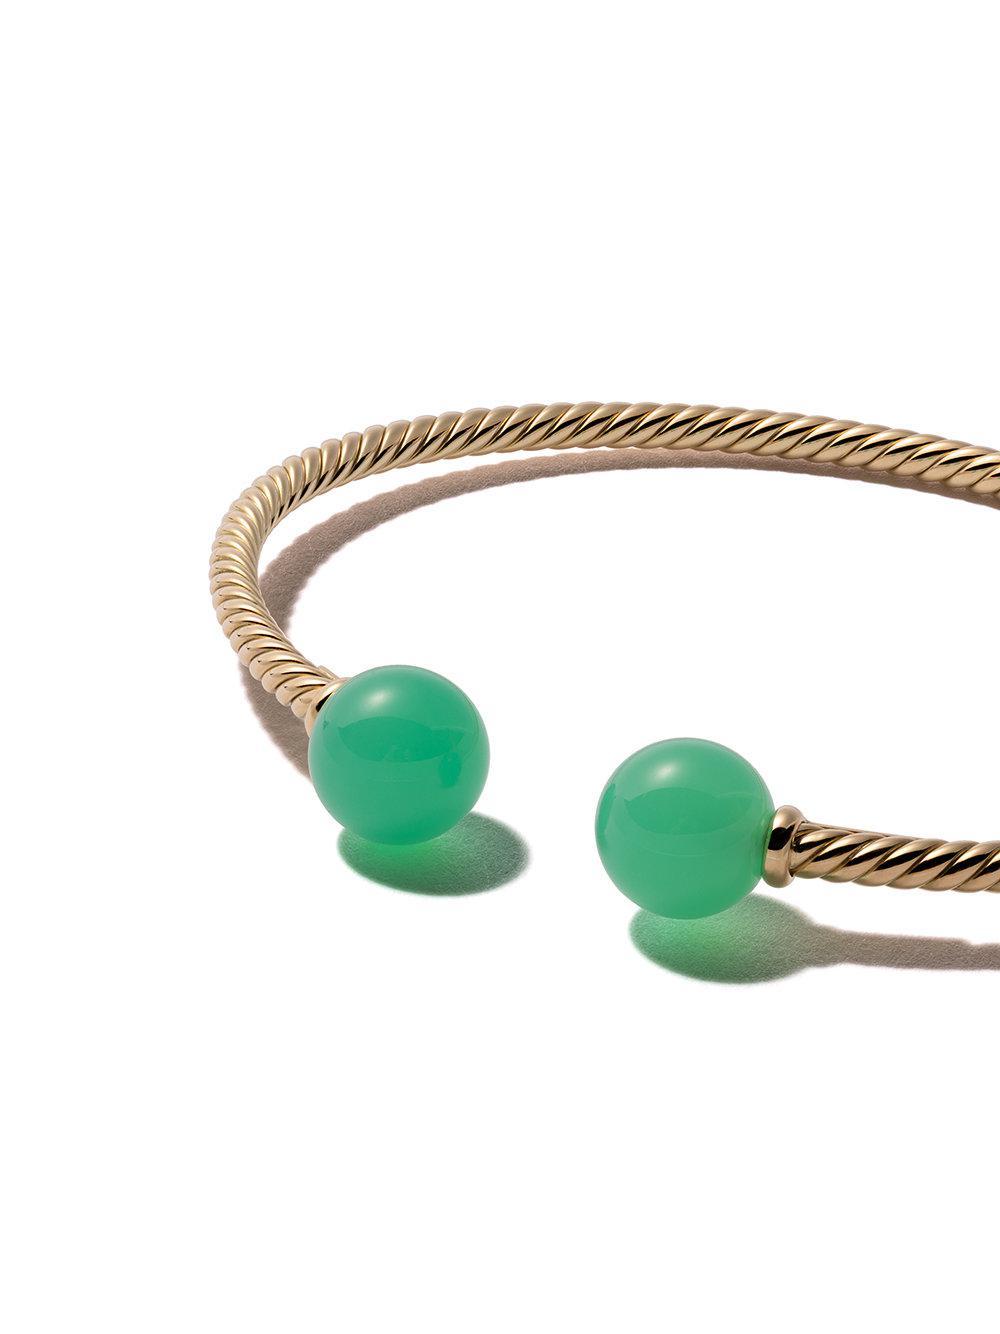 18kt yellow gold Solari chrysoprase bead cuff bracelet - Green David Yurman RsRDp6W